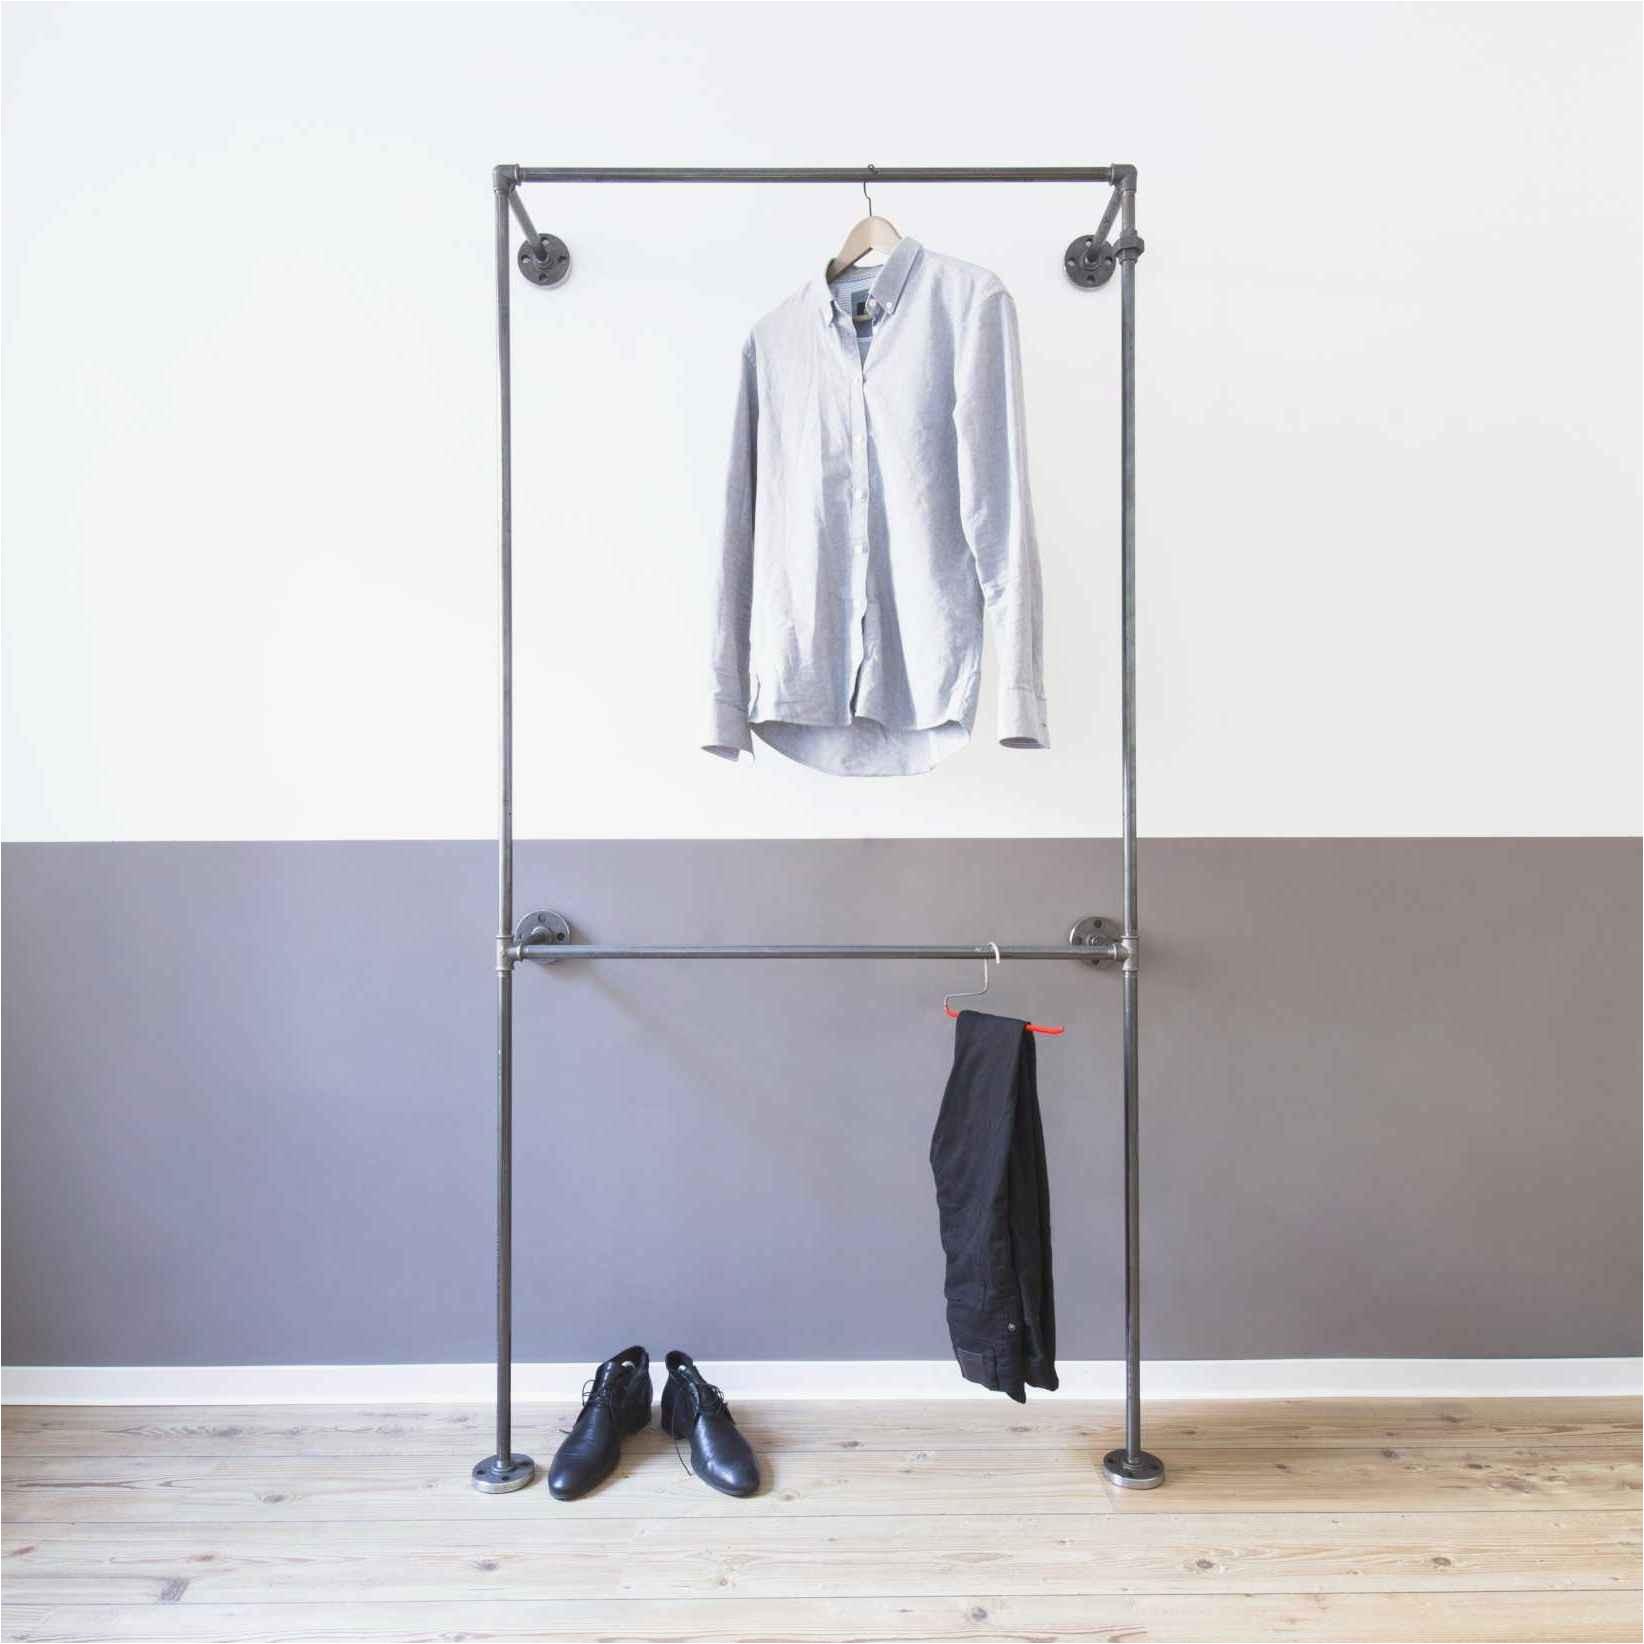 pax kleiderschrank bewundernswert schrank planen beautiful spigel line elegant schrank spiegel 0d of 57 frisch pax